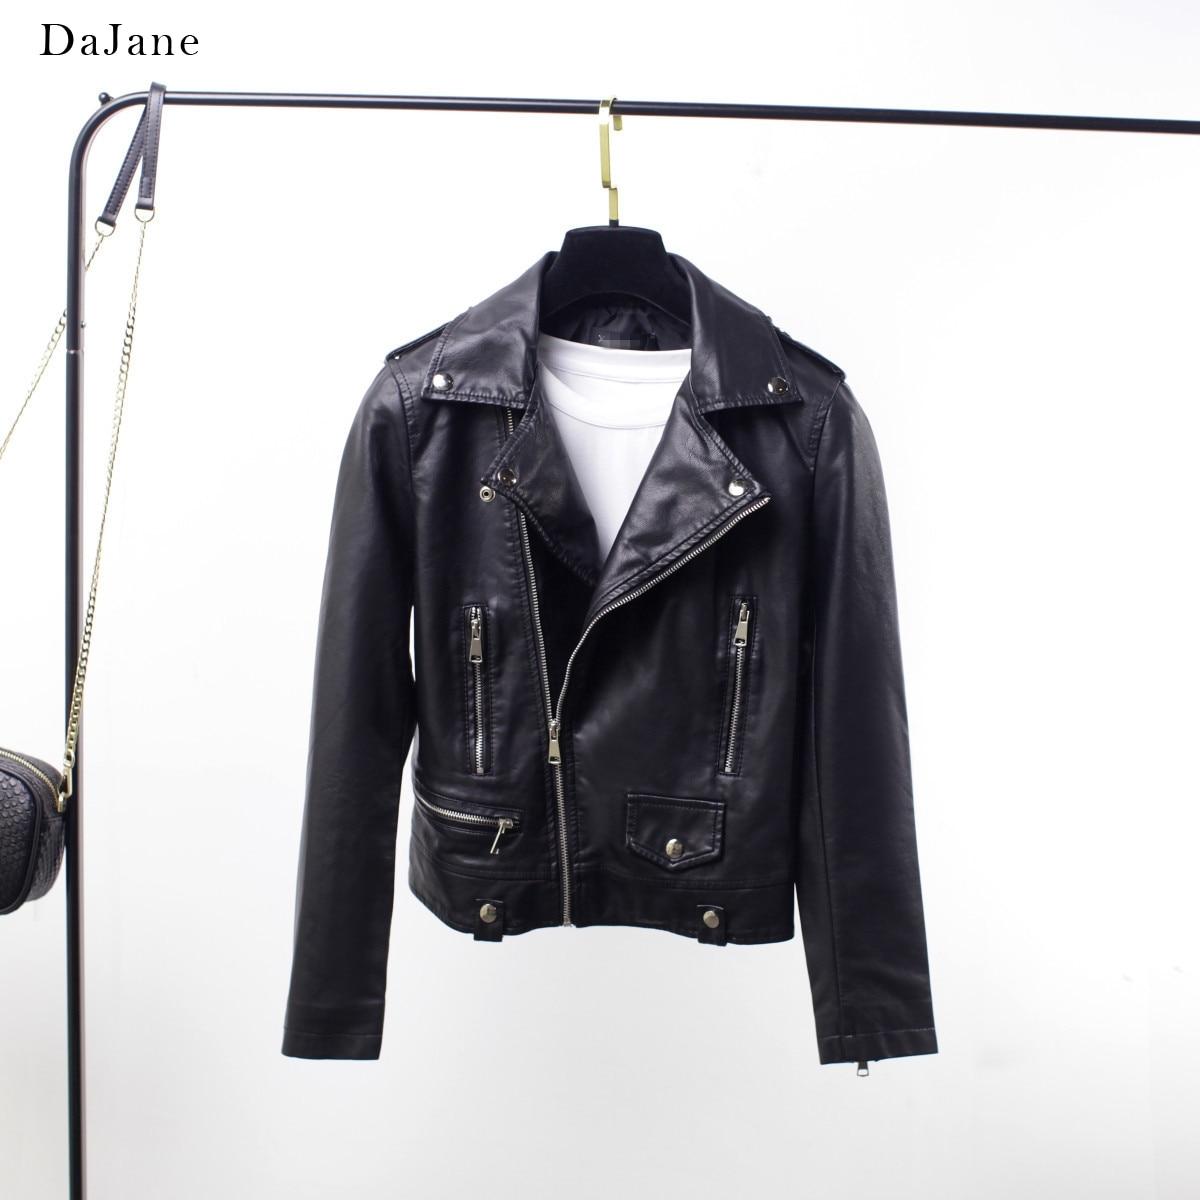 DaJane Korean women's Jacket Zheng Shuang Star With The Same Motorcycle   Leather   Women Short PU Jacket